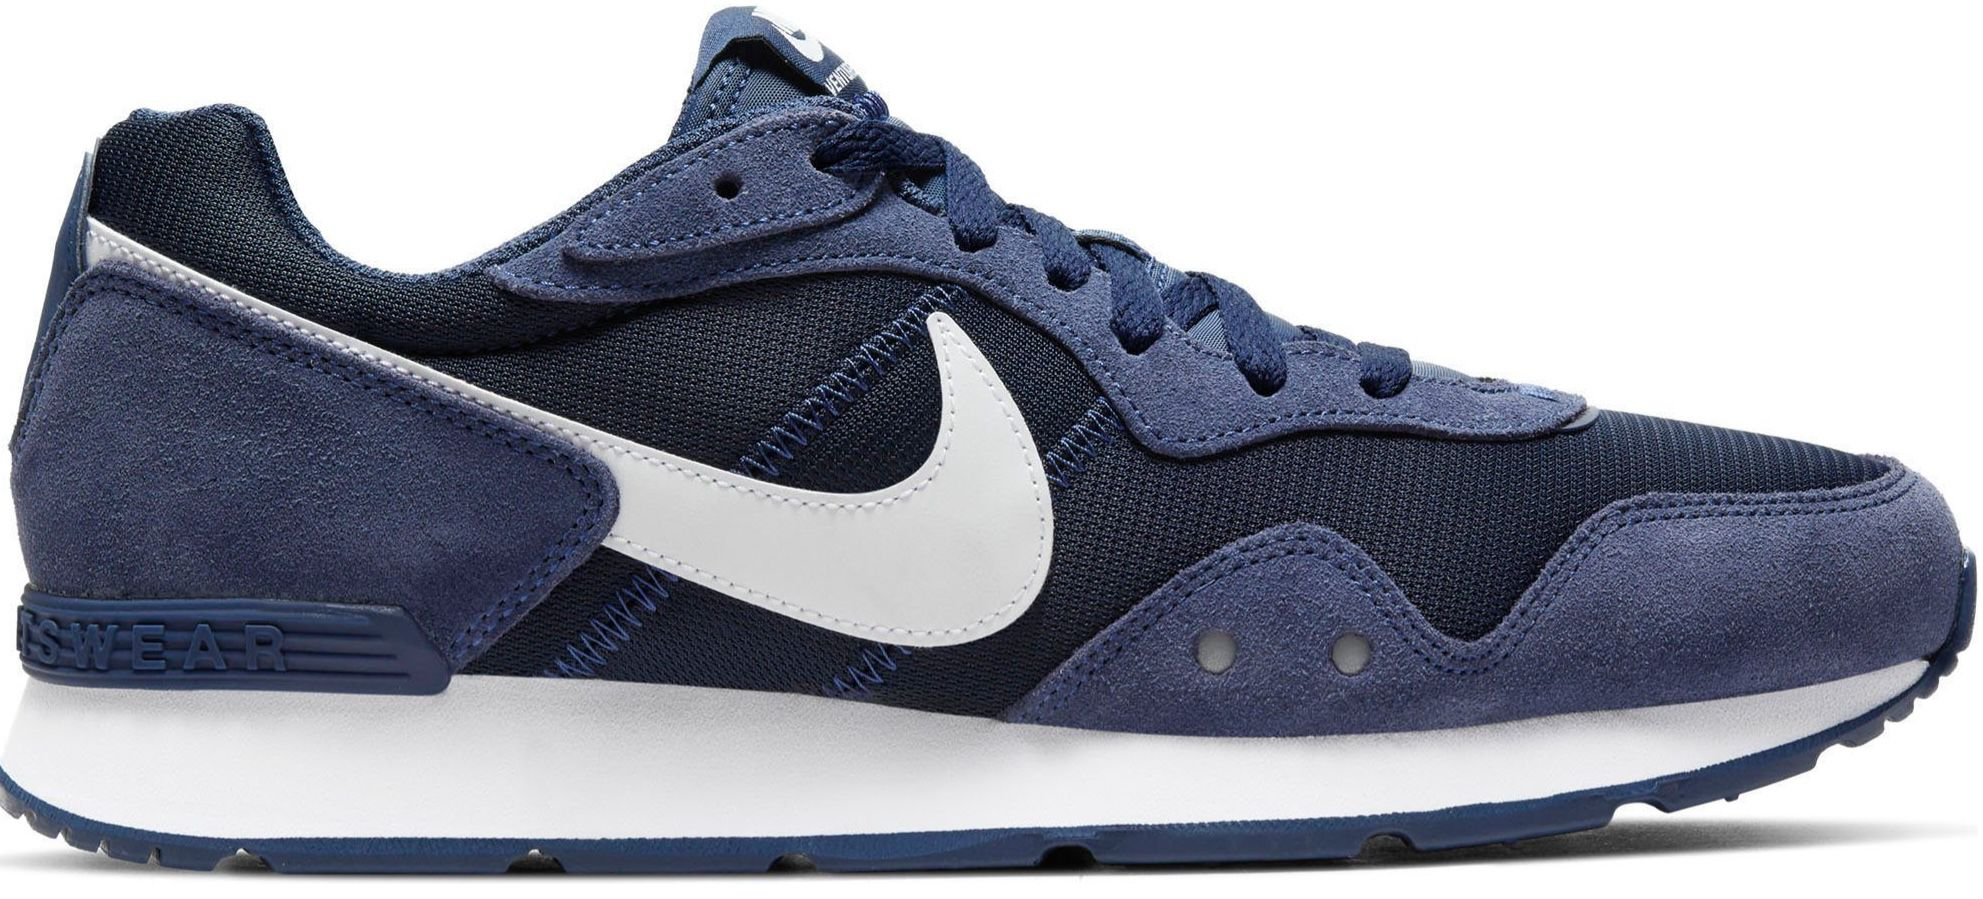 Nike Venture Runner Herren Sneaker in Navy für 29,99€ (statt 39€)